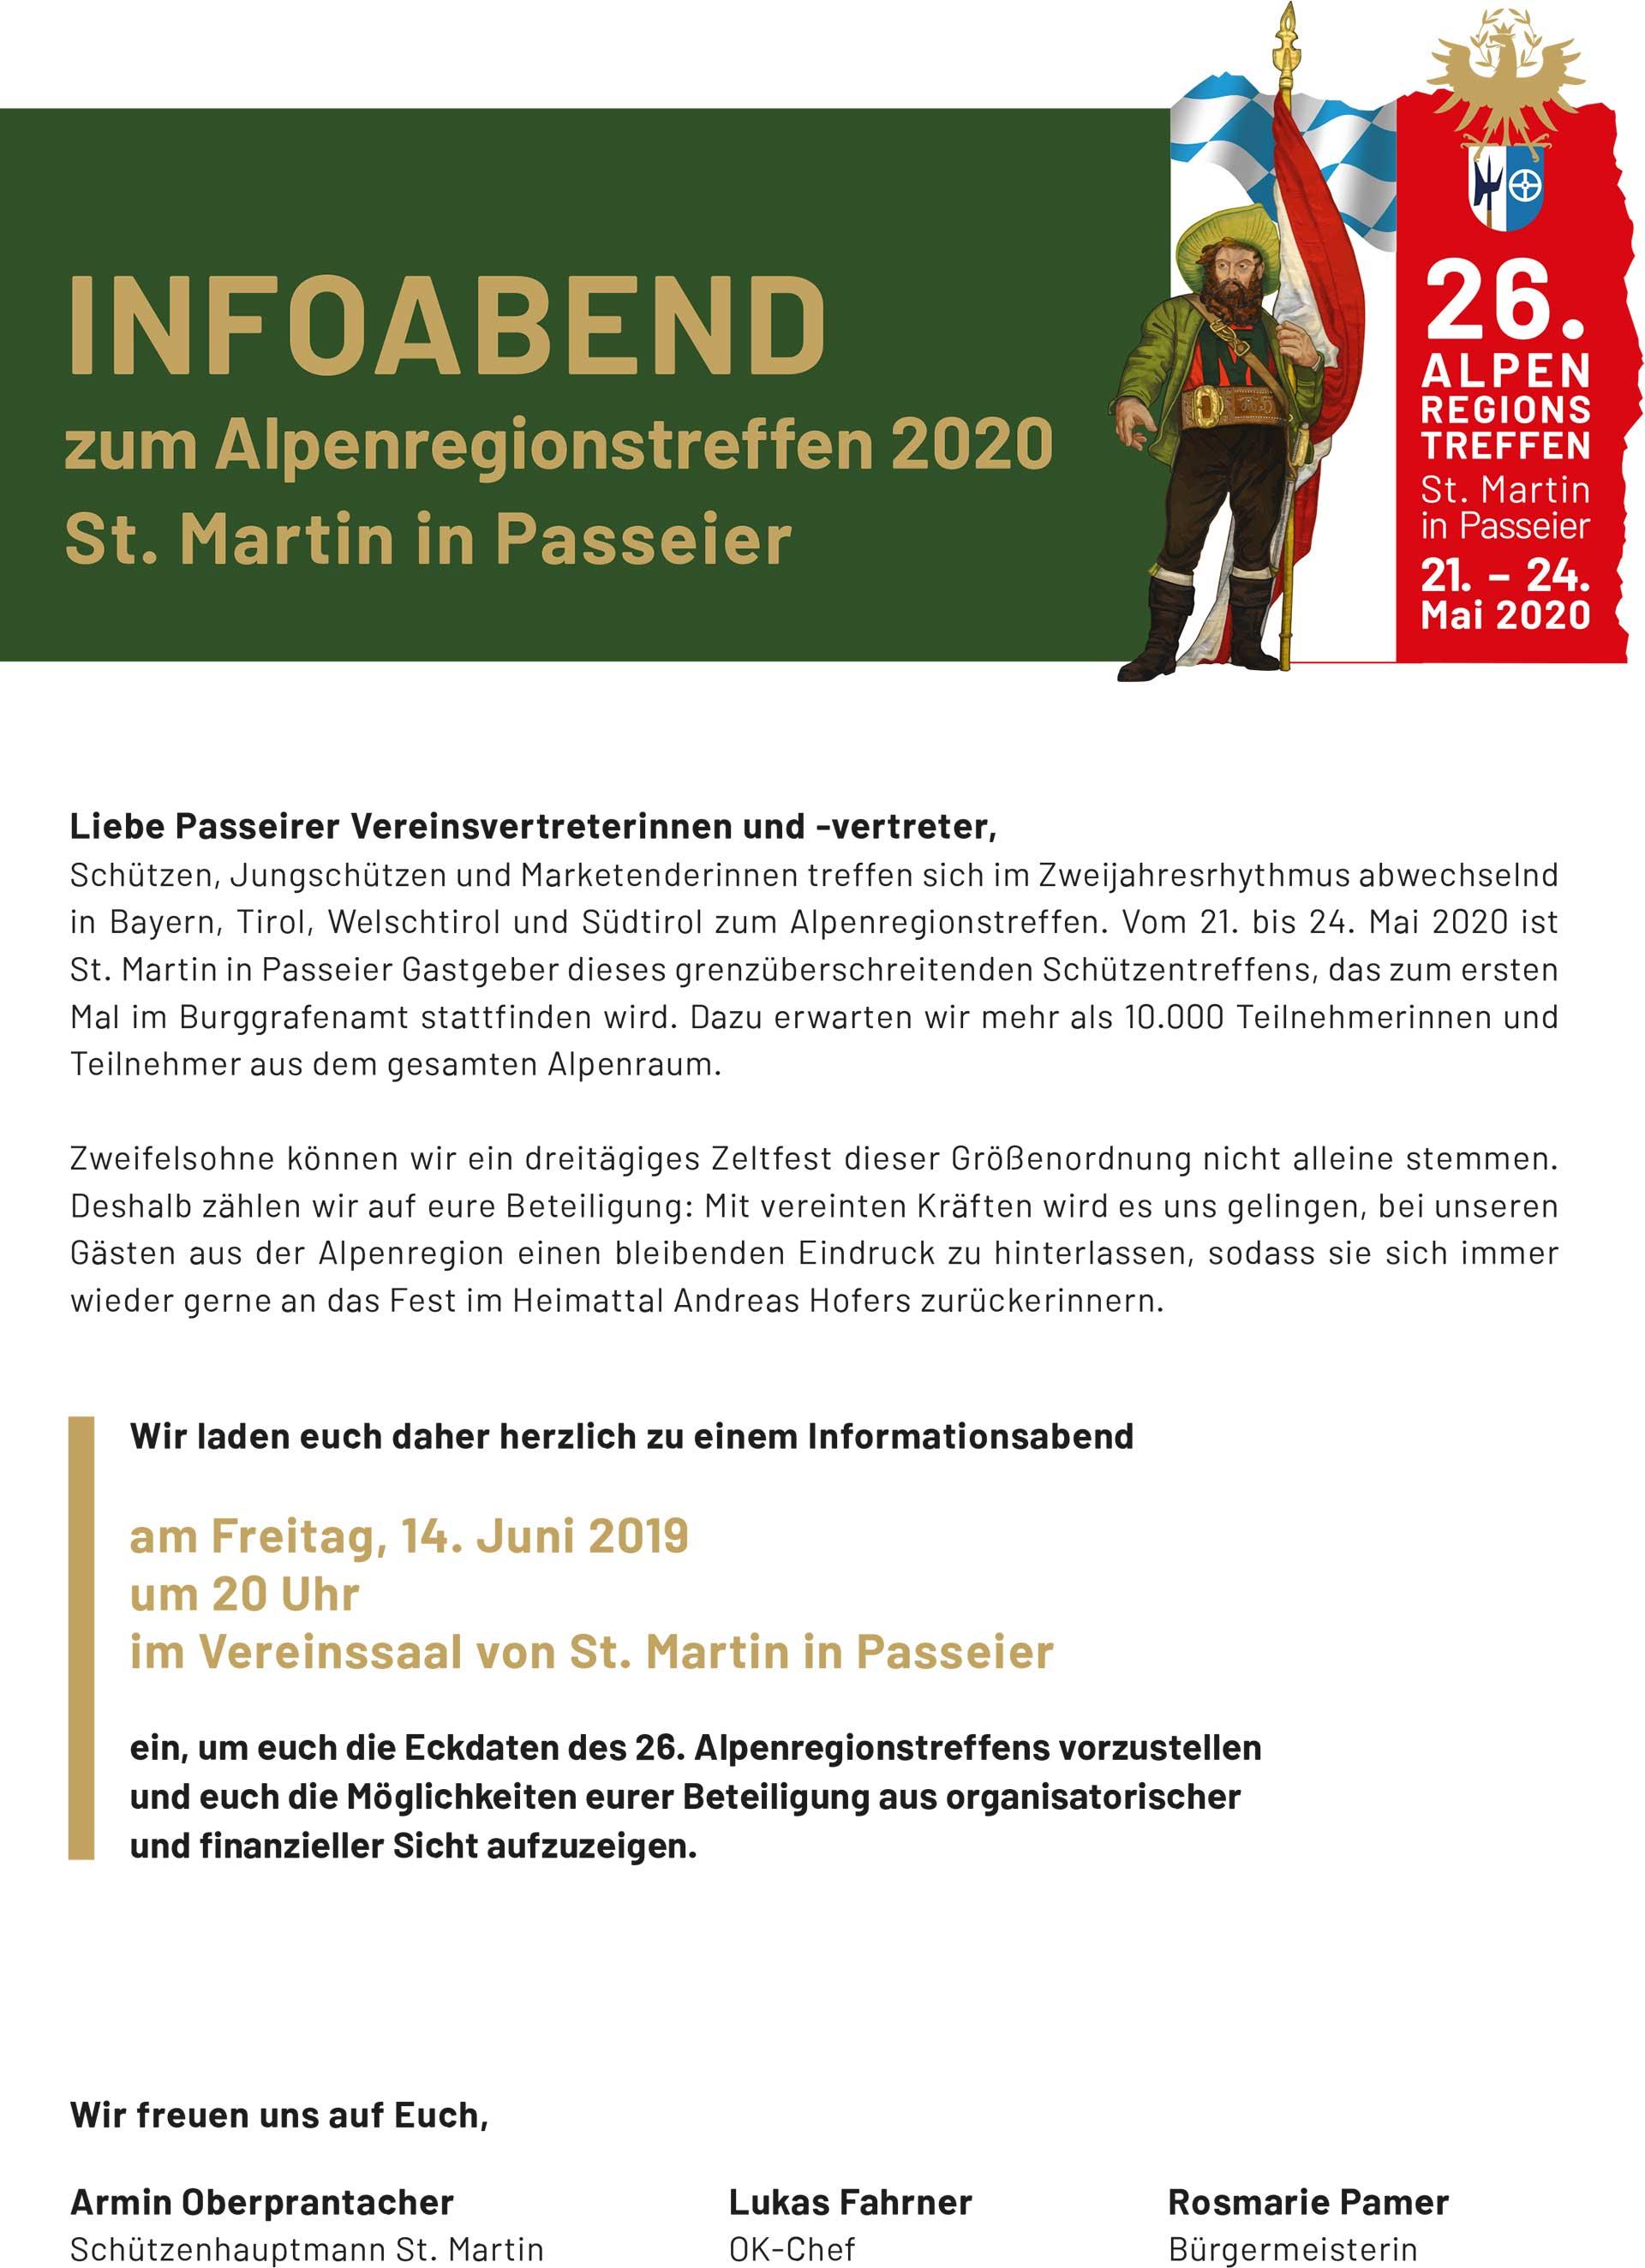 Alpenregionstreffen 2020: Infoabend zum Alpenregionstreffen 2020